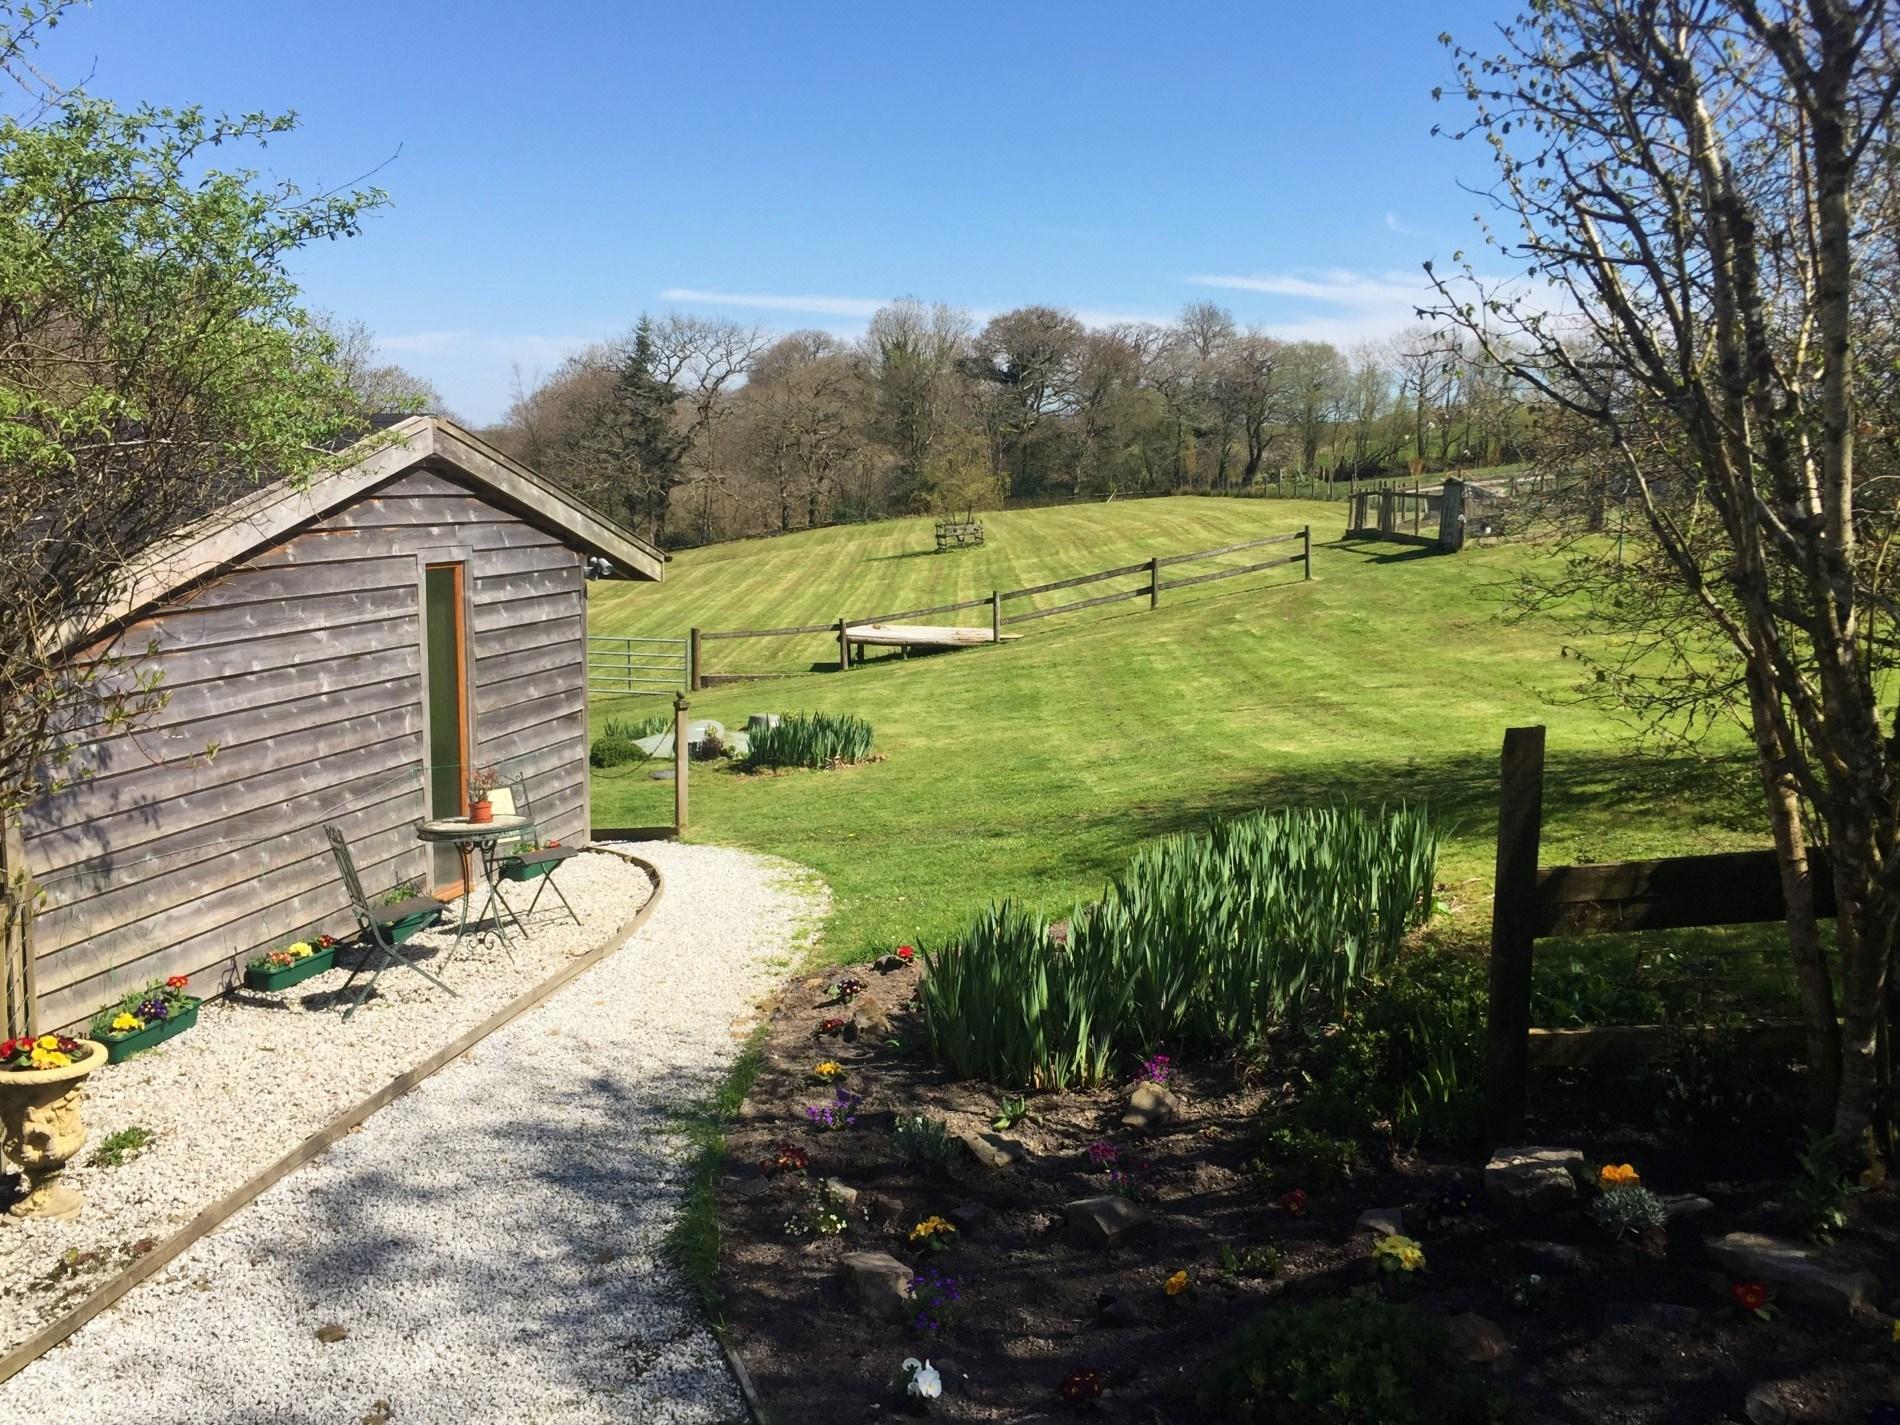 3 Bedroom Cottage in Holsworthy, Devon